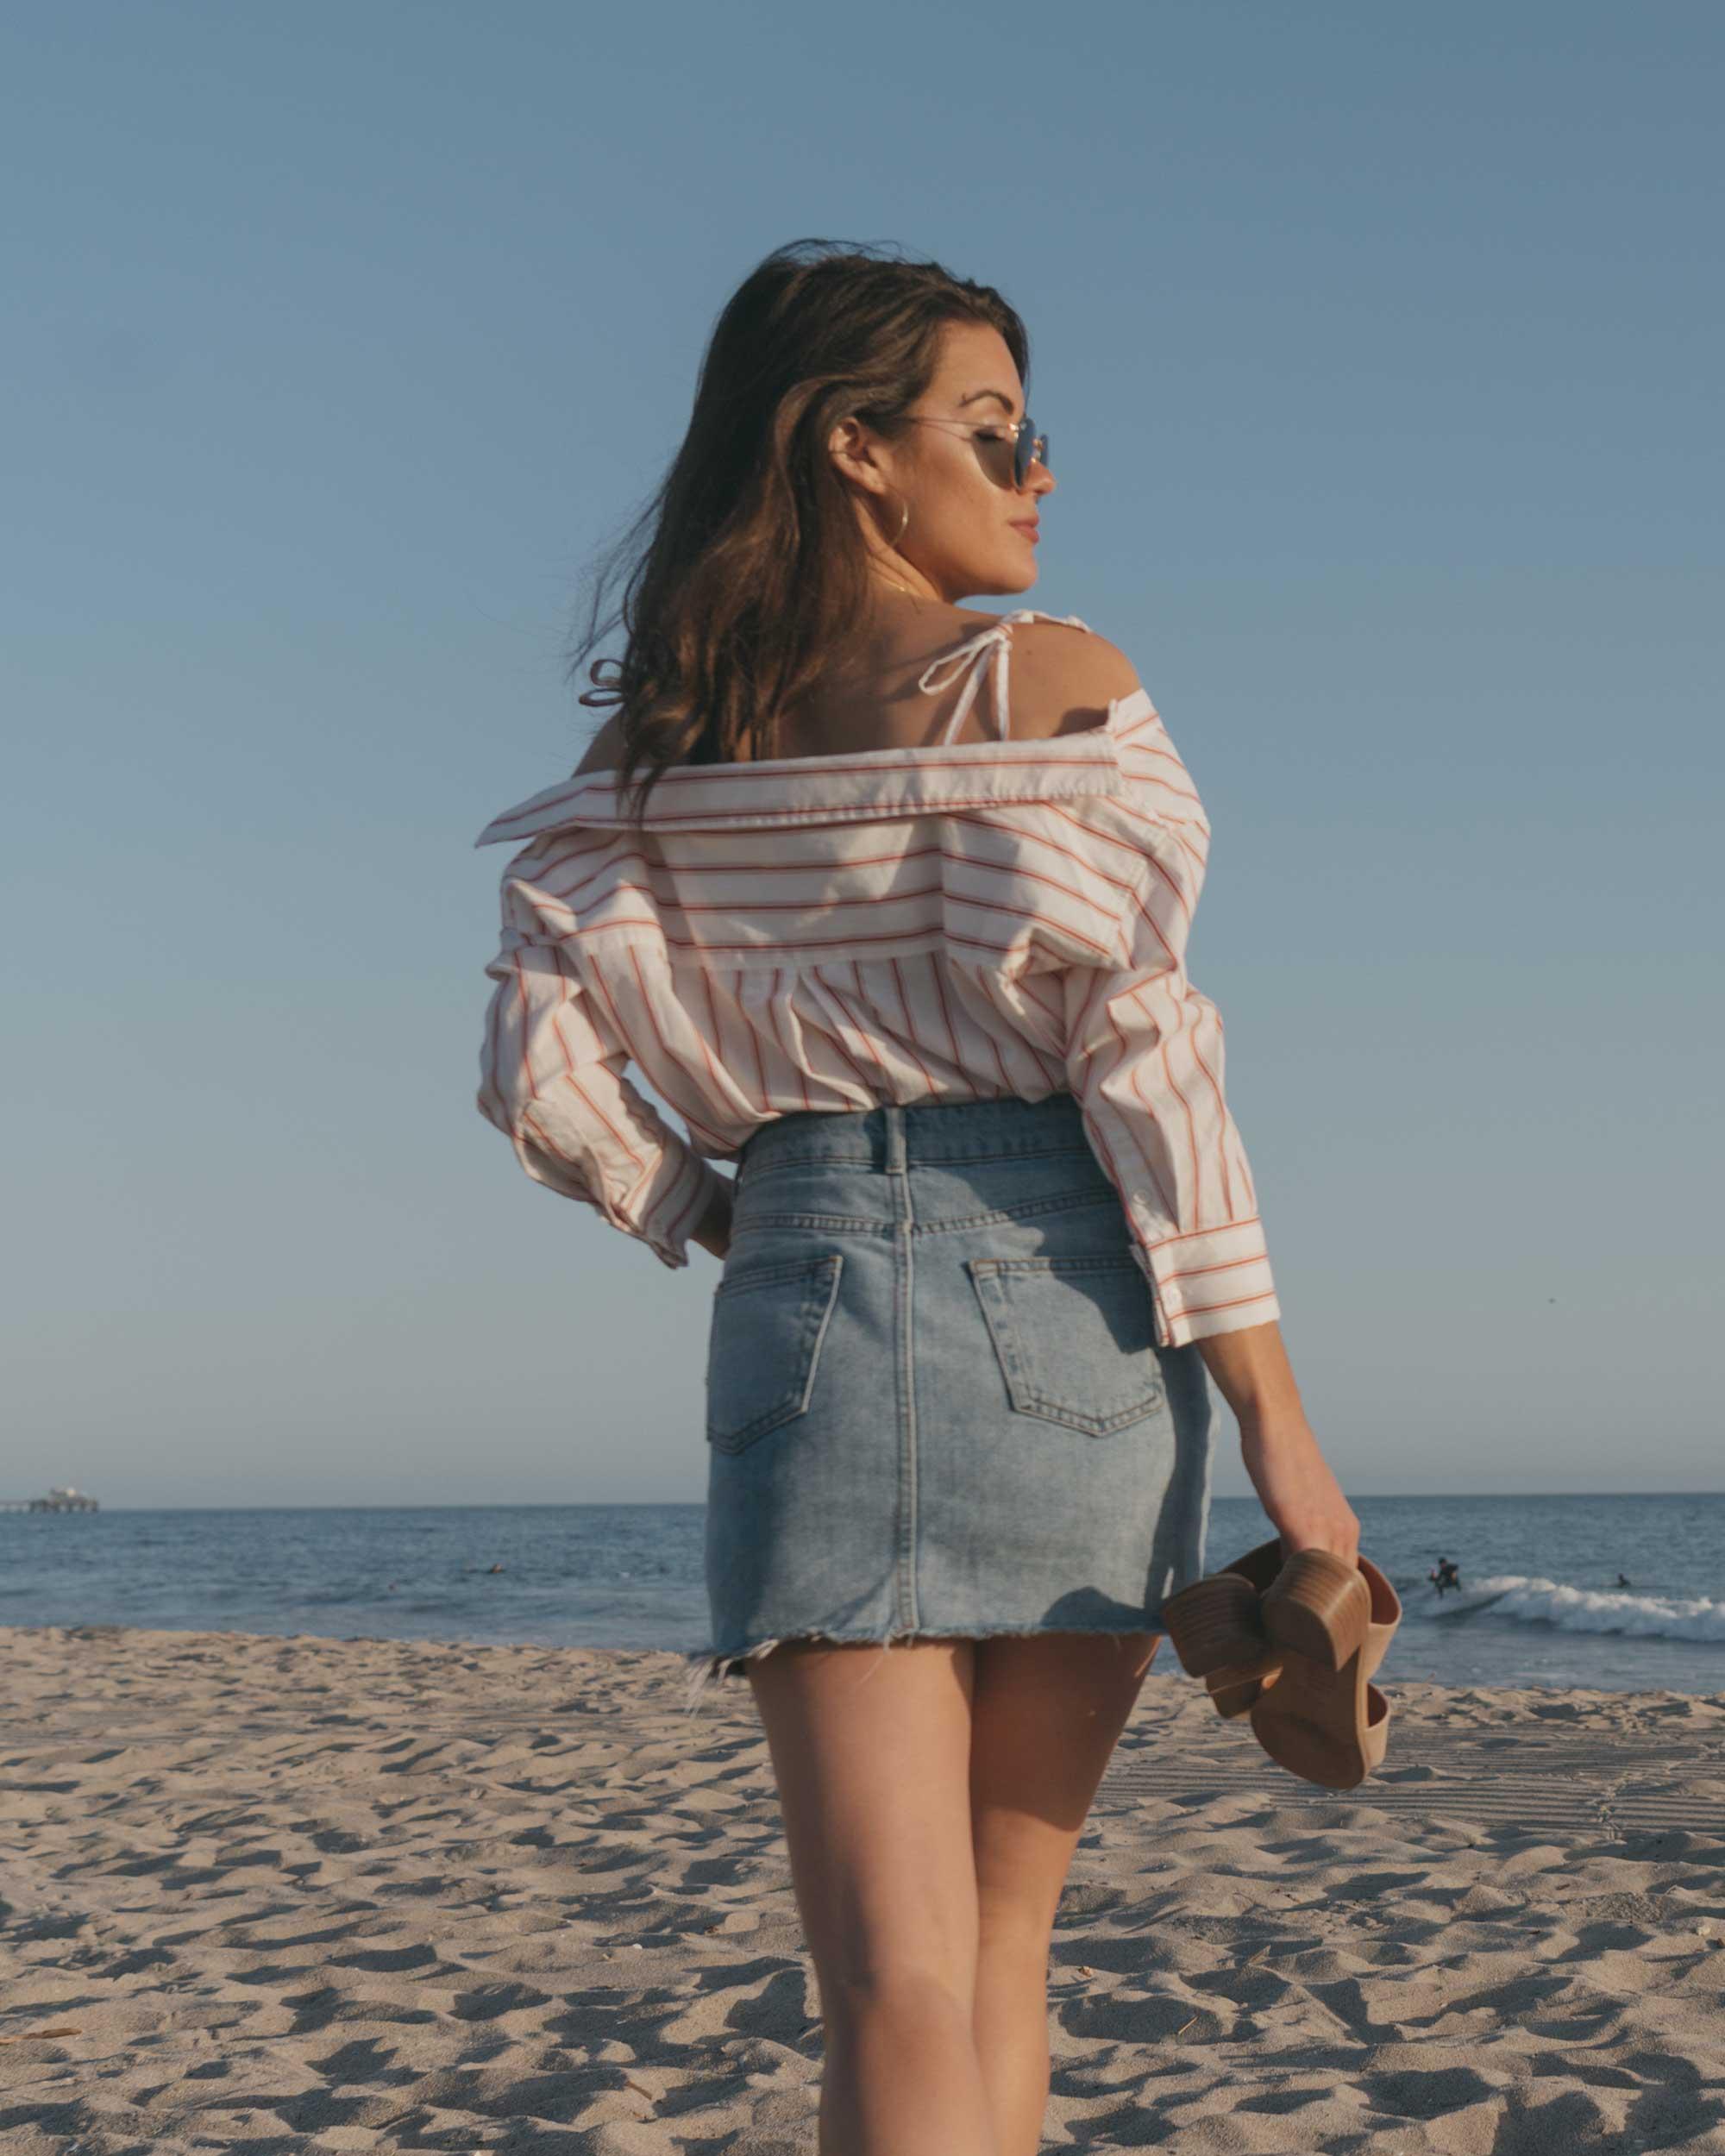 Joie Alvina Tie Front Stripe Shirt High Rise Mini Skirt Newport Beach California Summer Outfit3.jpg